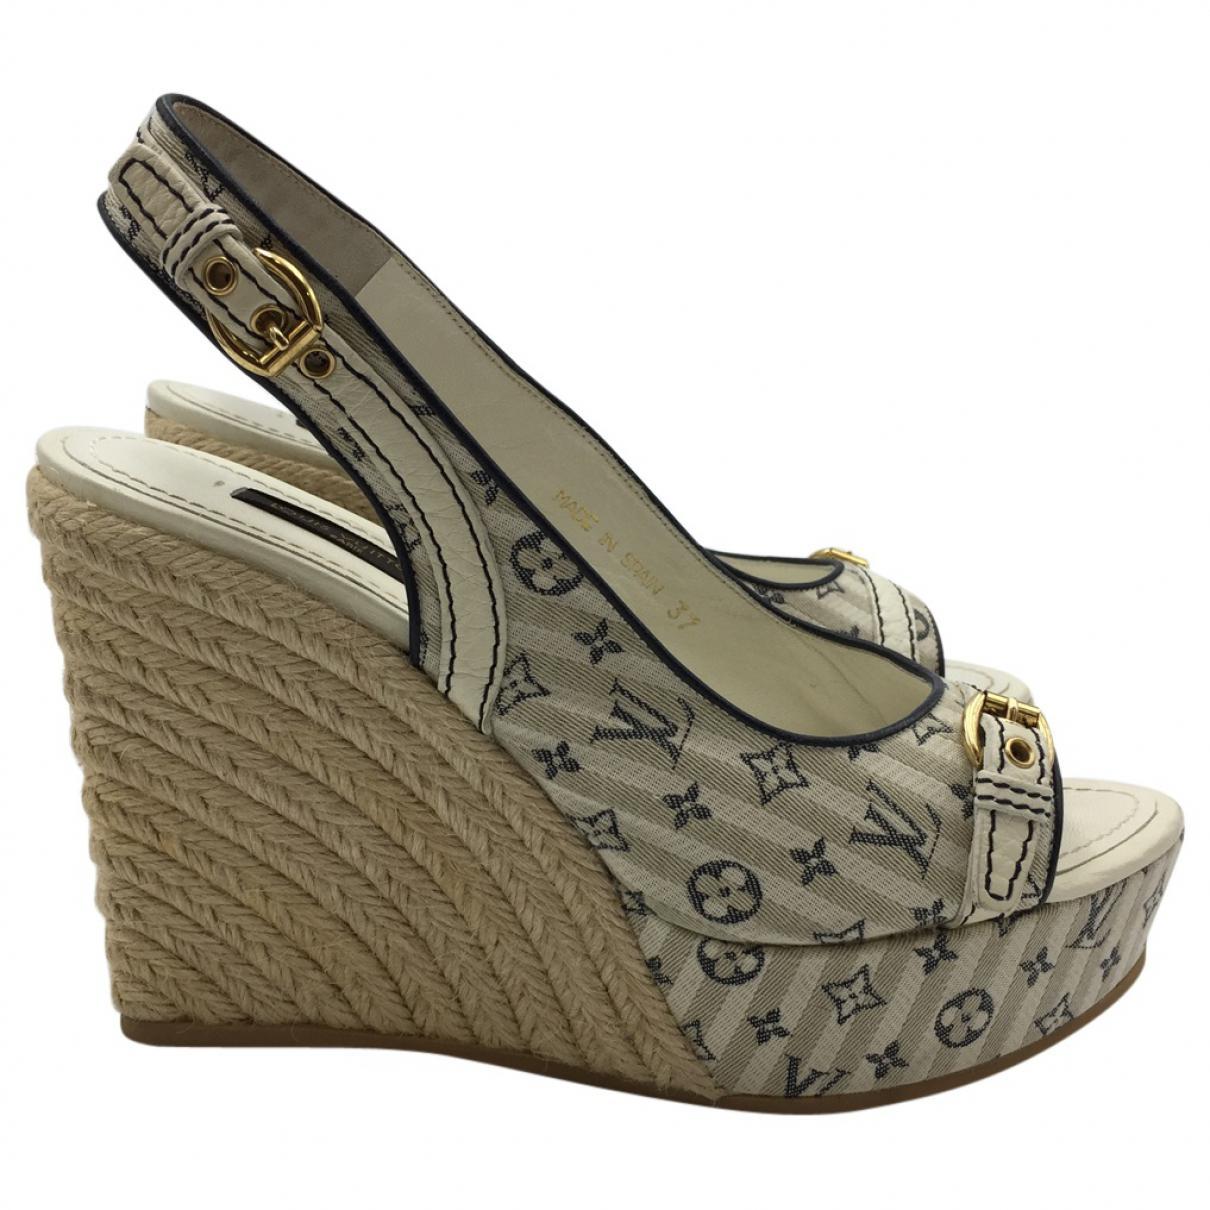 Pre-owned - Cloth sandals Louis Vuitton qW4eg6u